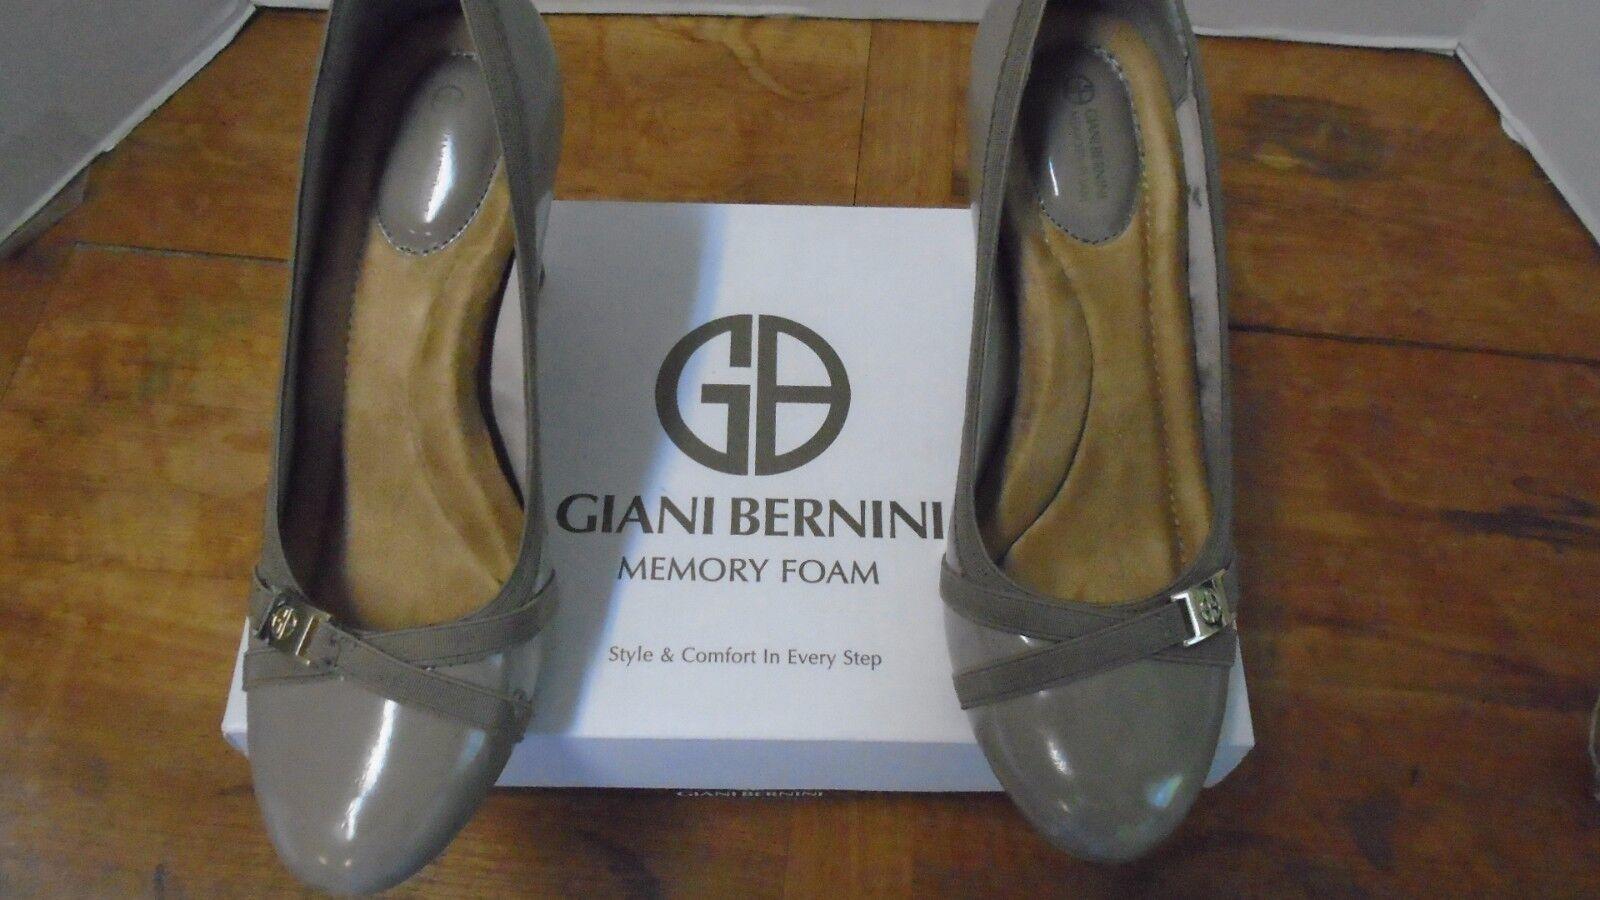 Giani Bernini Memory Foam Women's shoes New 8 1 2 Tan Heel Vollettbrn Dark Taupe